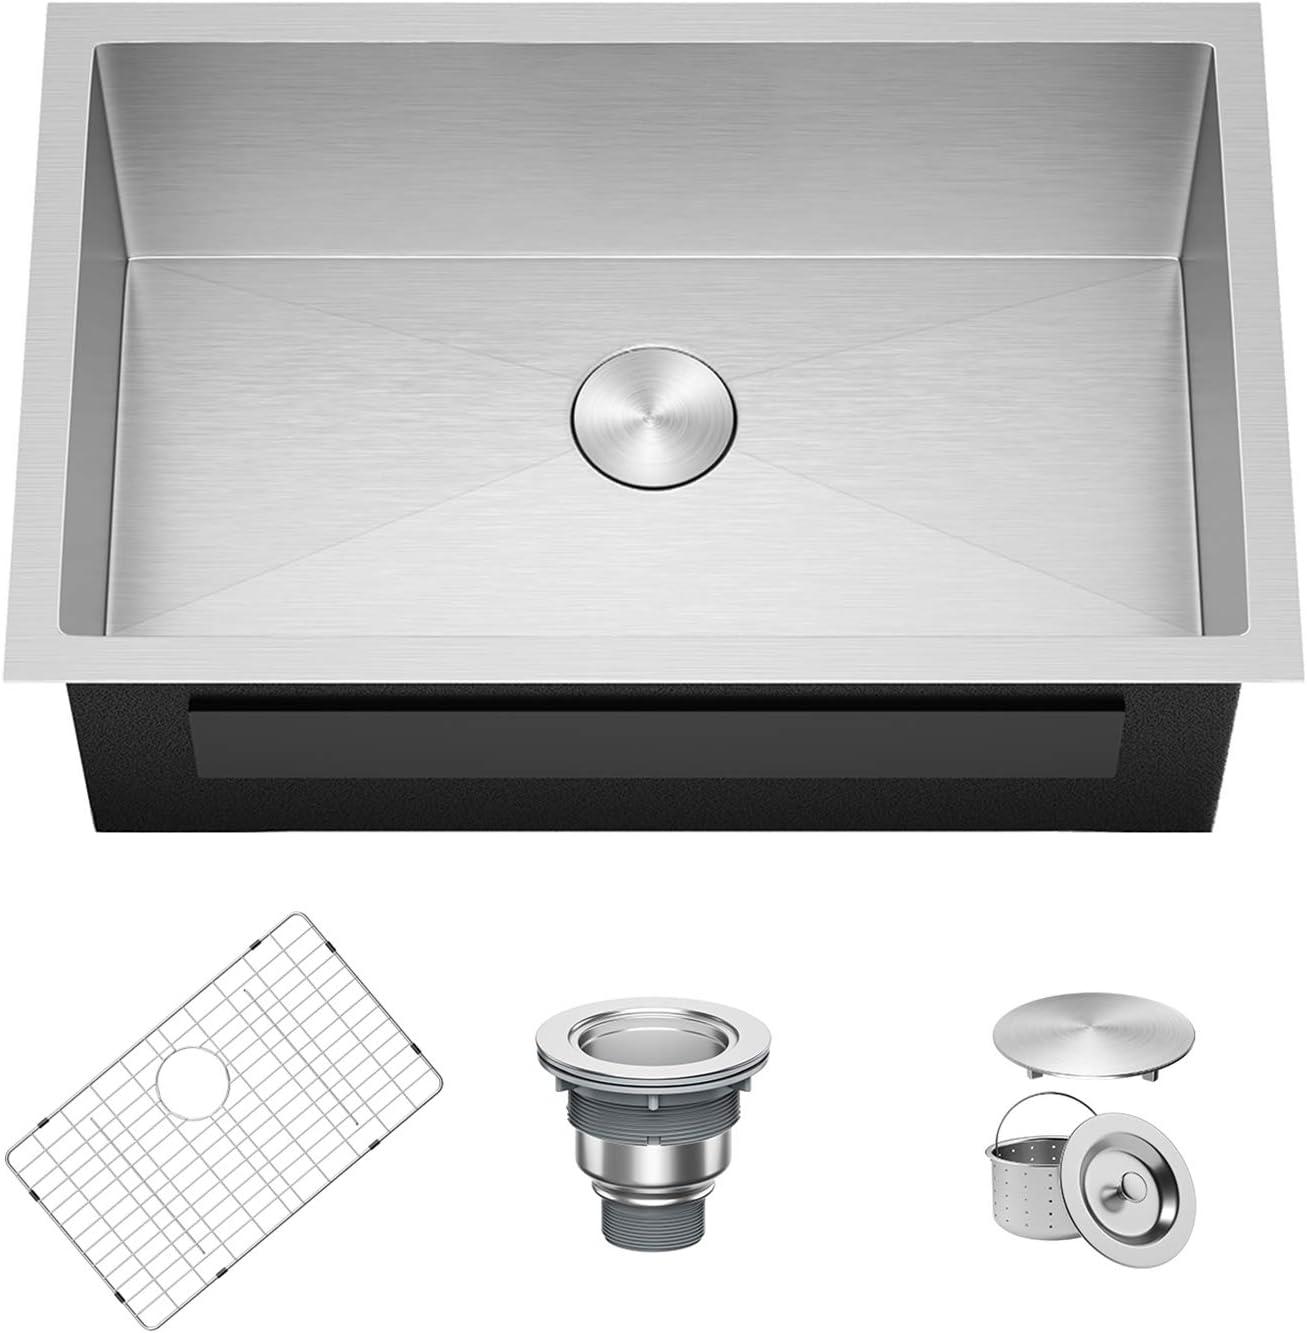 X Home 30 x 18 Inch Undermount Kitchen Sink Single Bowl, 16 Gauge Stainless Steel Kitchen Workstation Sink with R10 Corners, Fits 33 Inch Cabinet